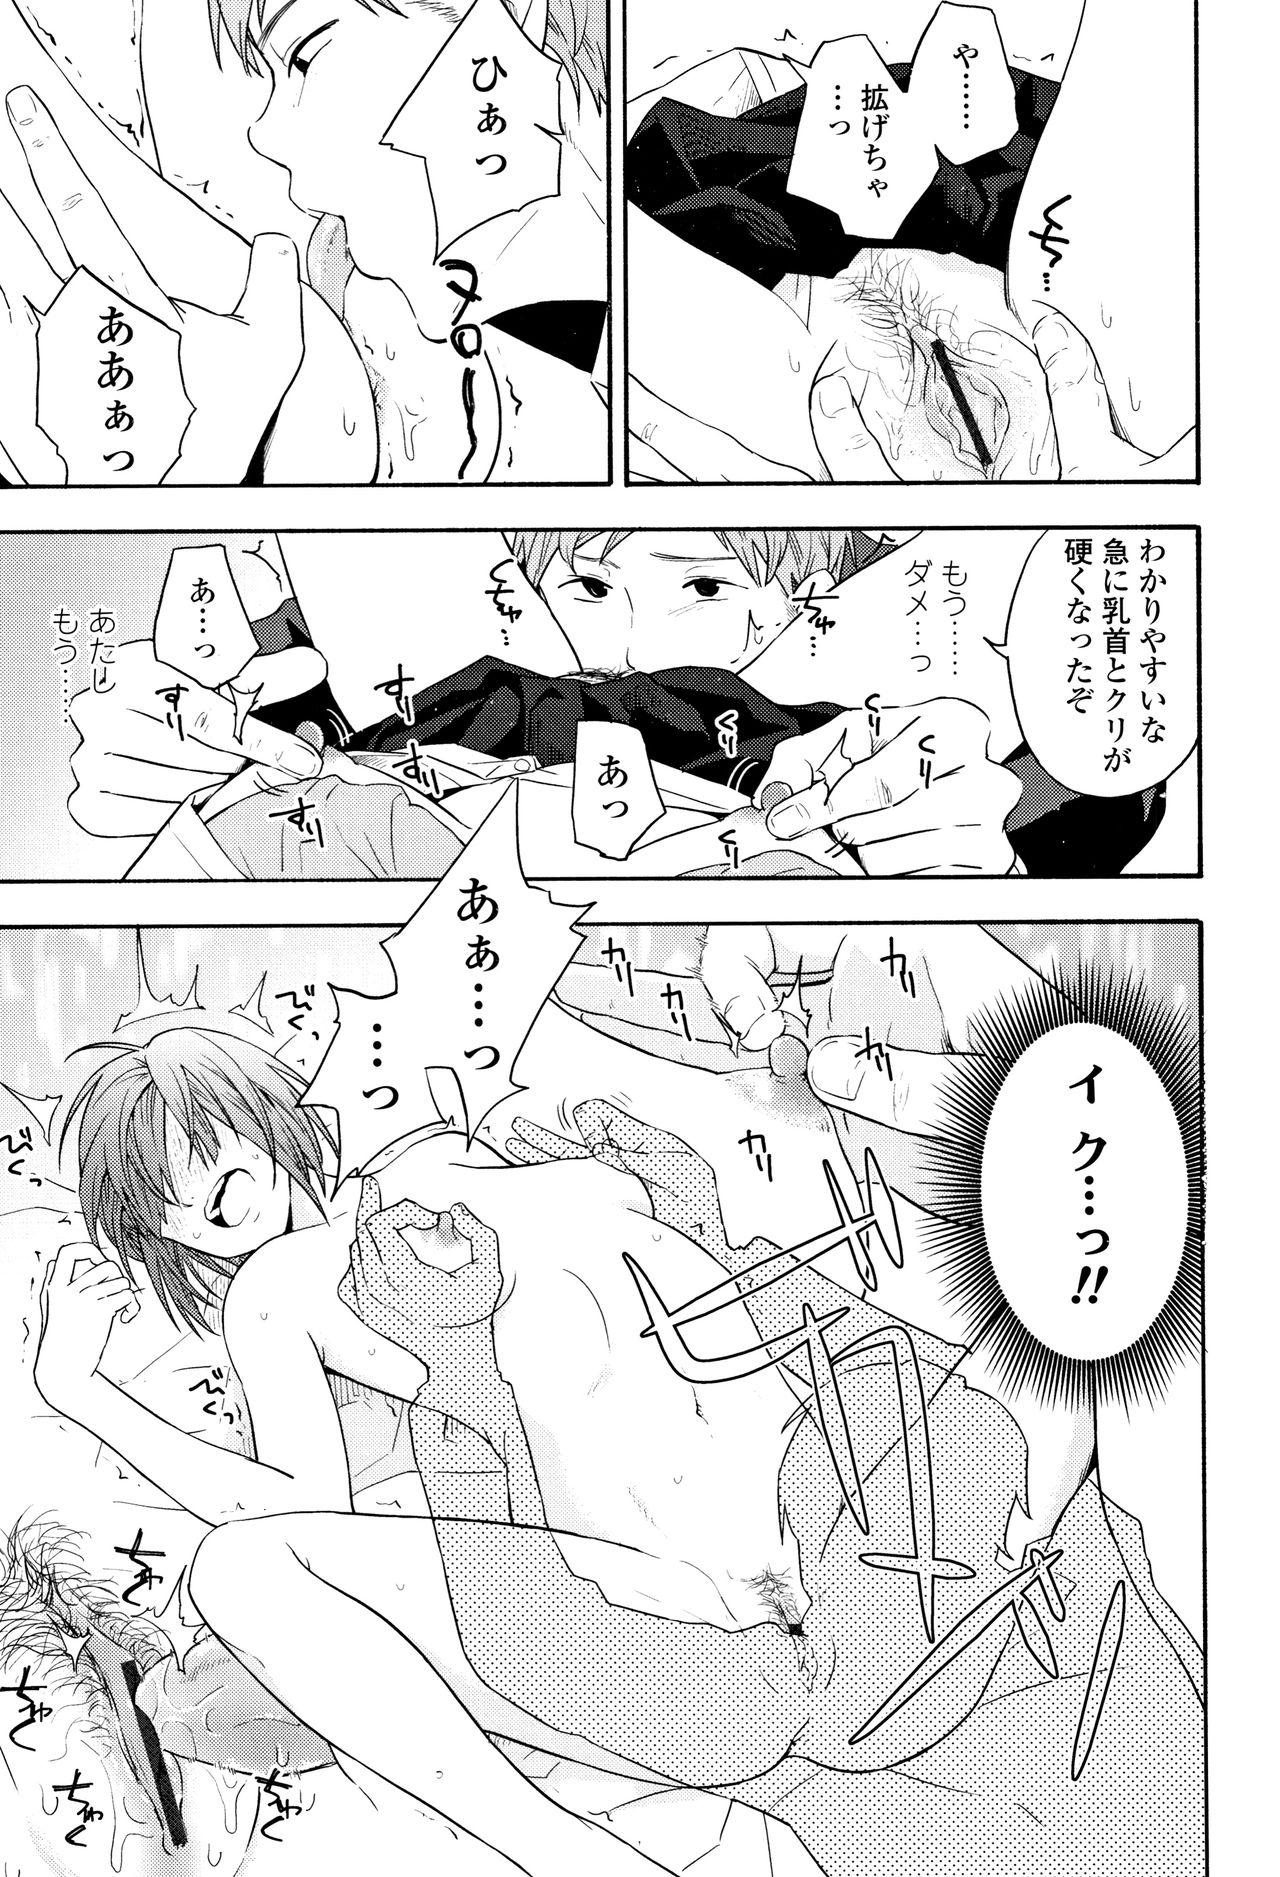 Shishunki no Eros - puberty eros 15